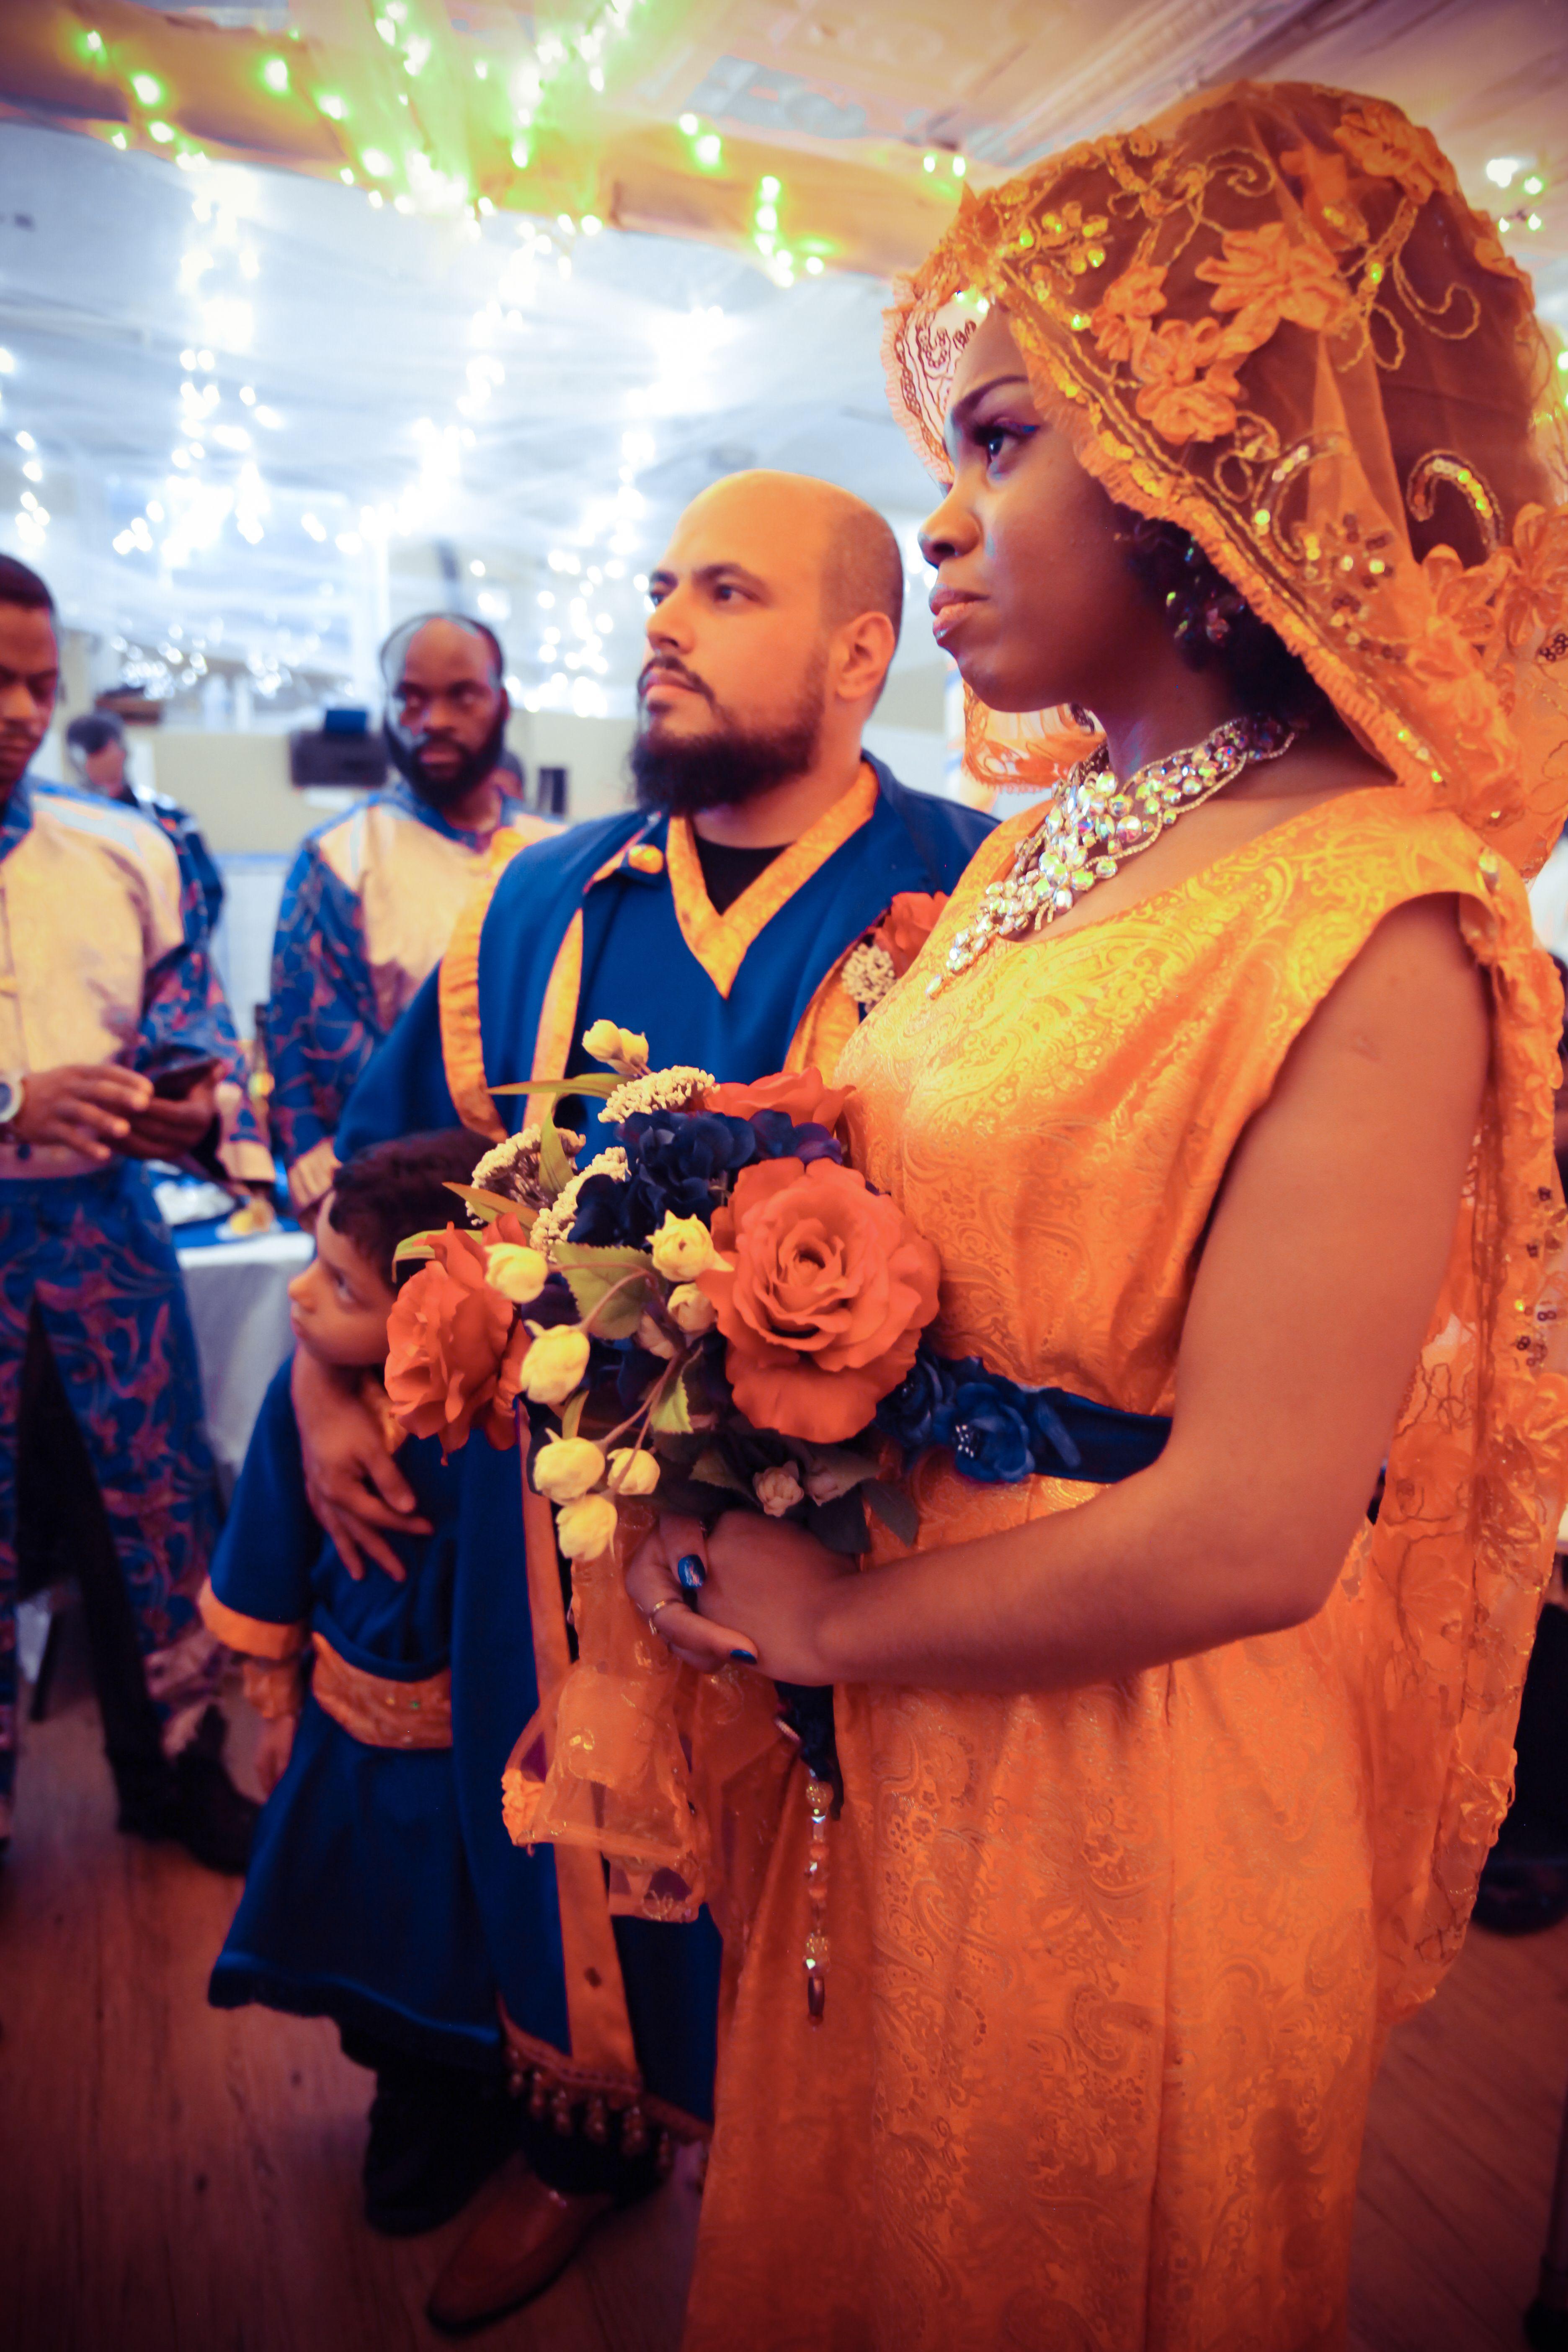 Hebrew israelite wedding ceremony. THE ANCIENT JEWISH